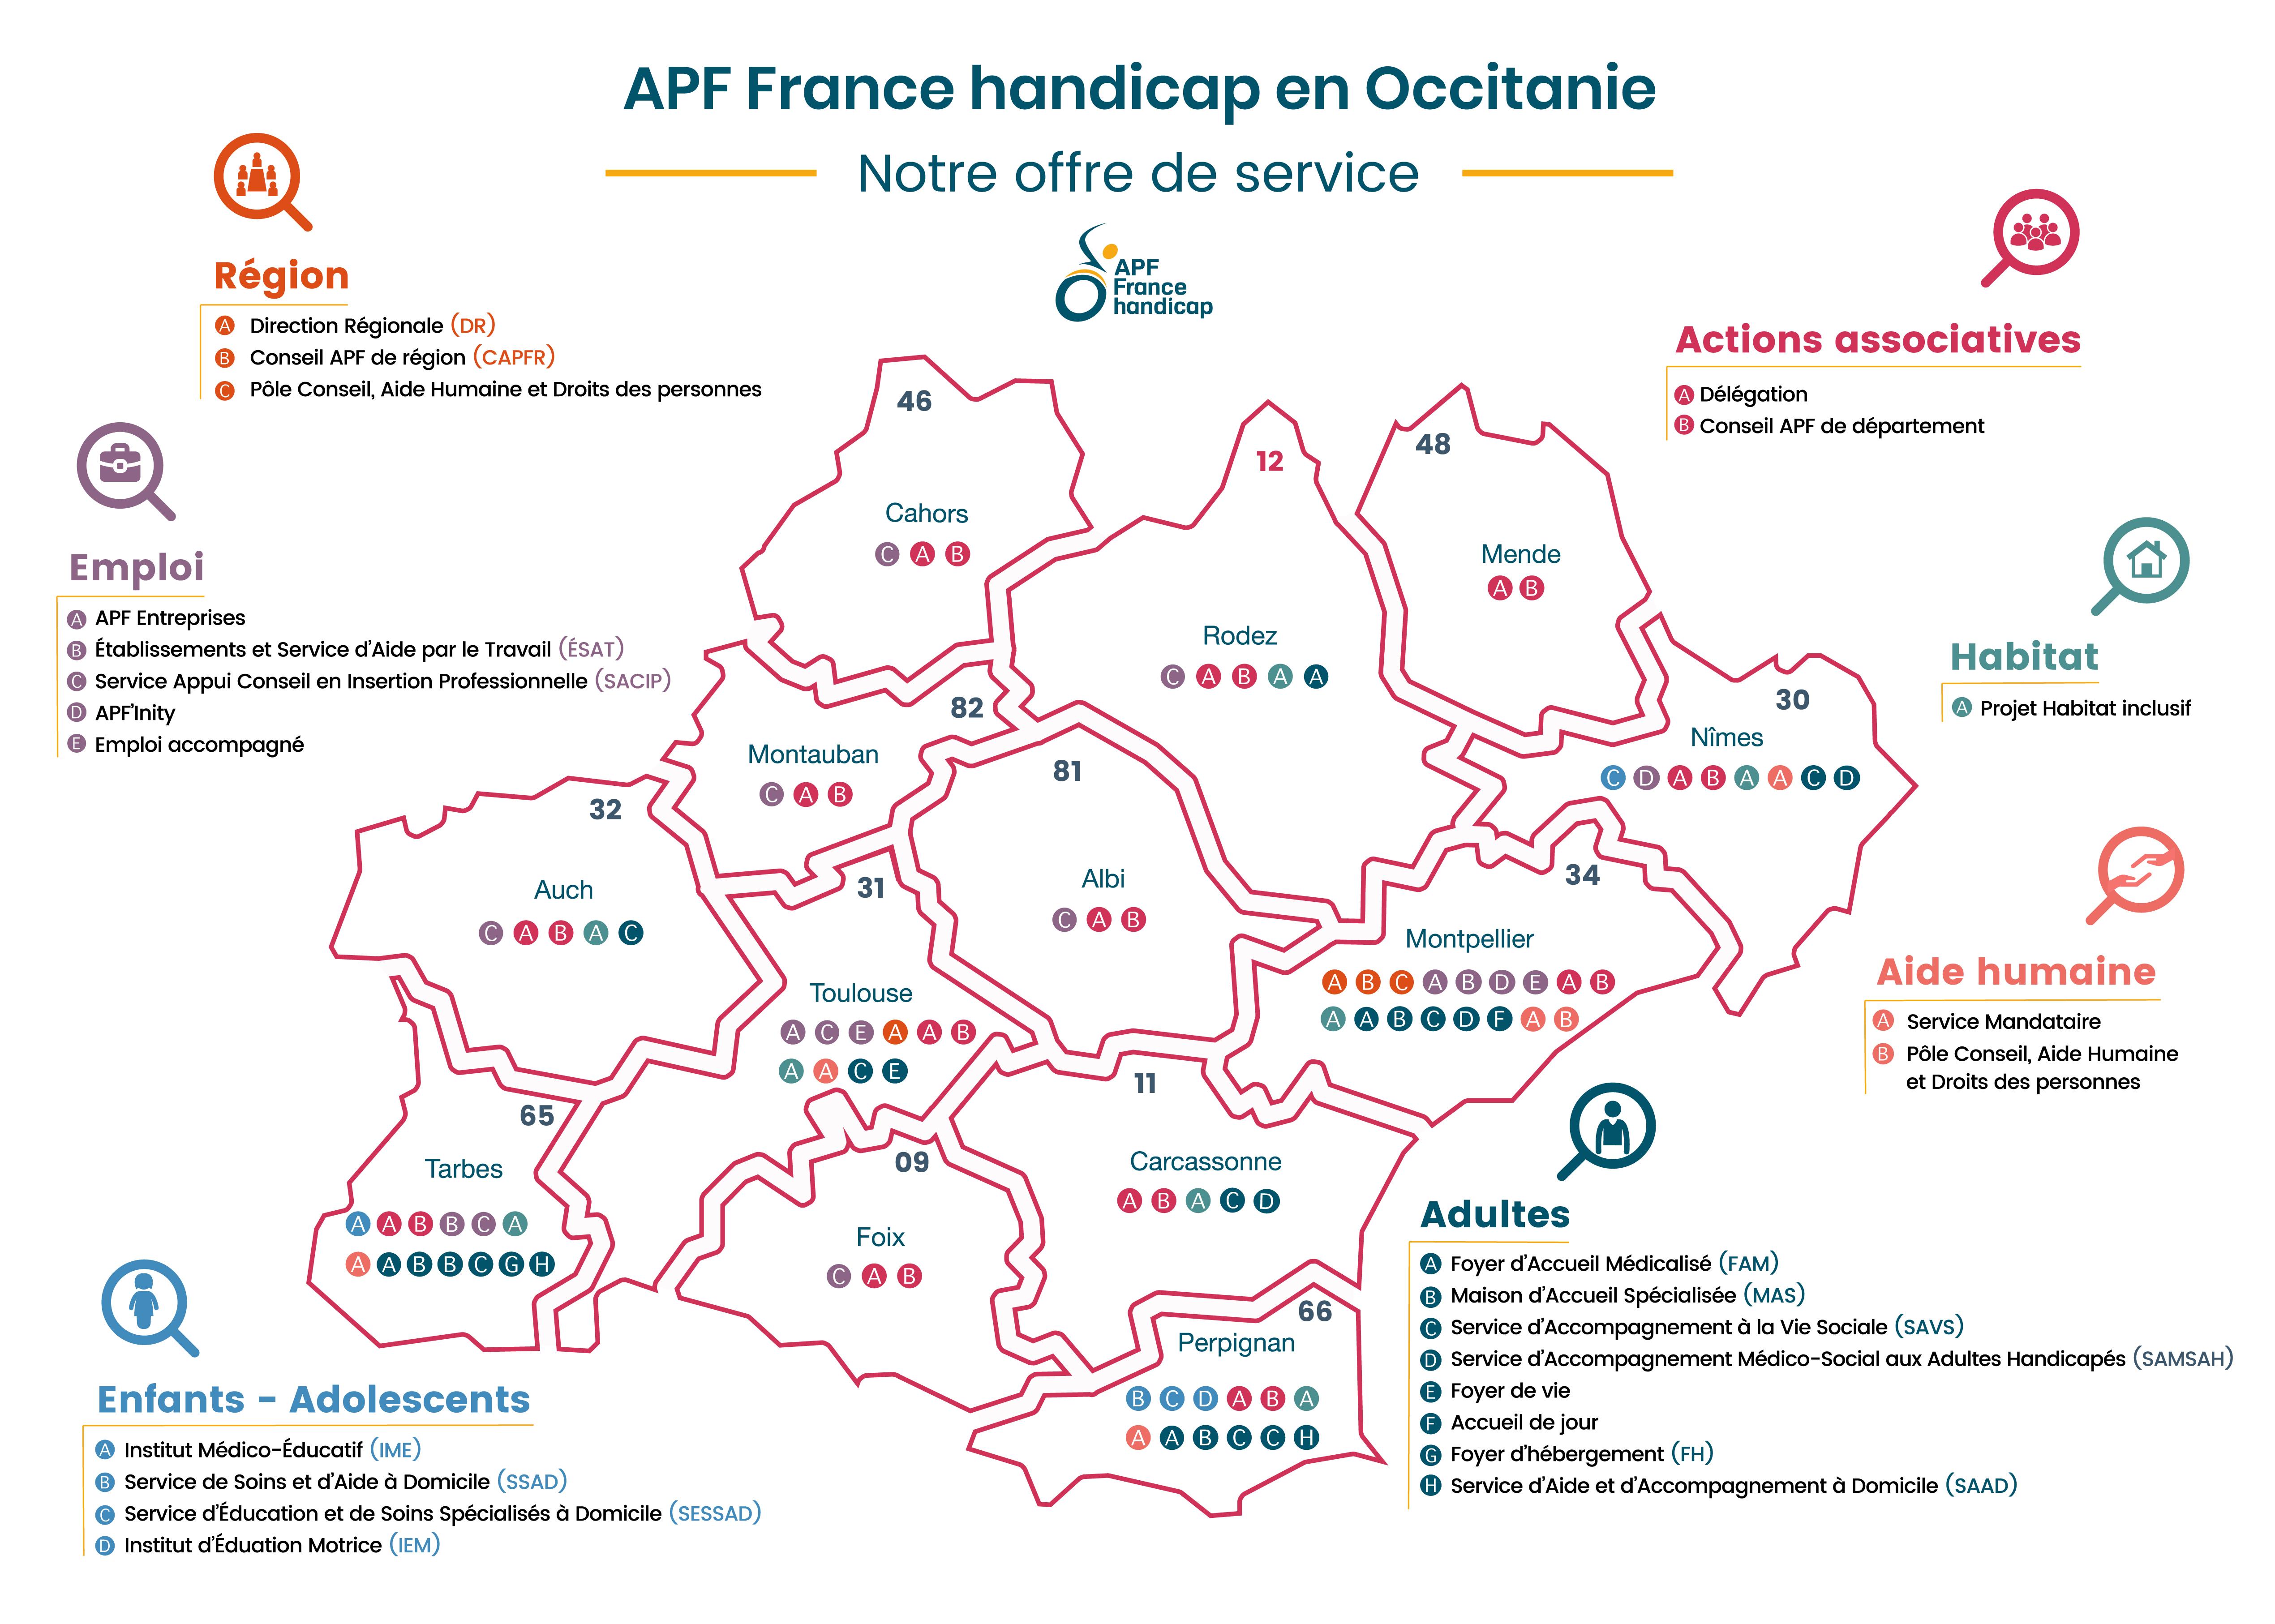 offre_de_service_apf_france_handicap_occitanie